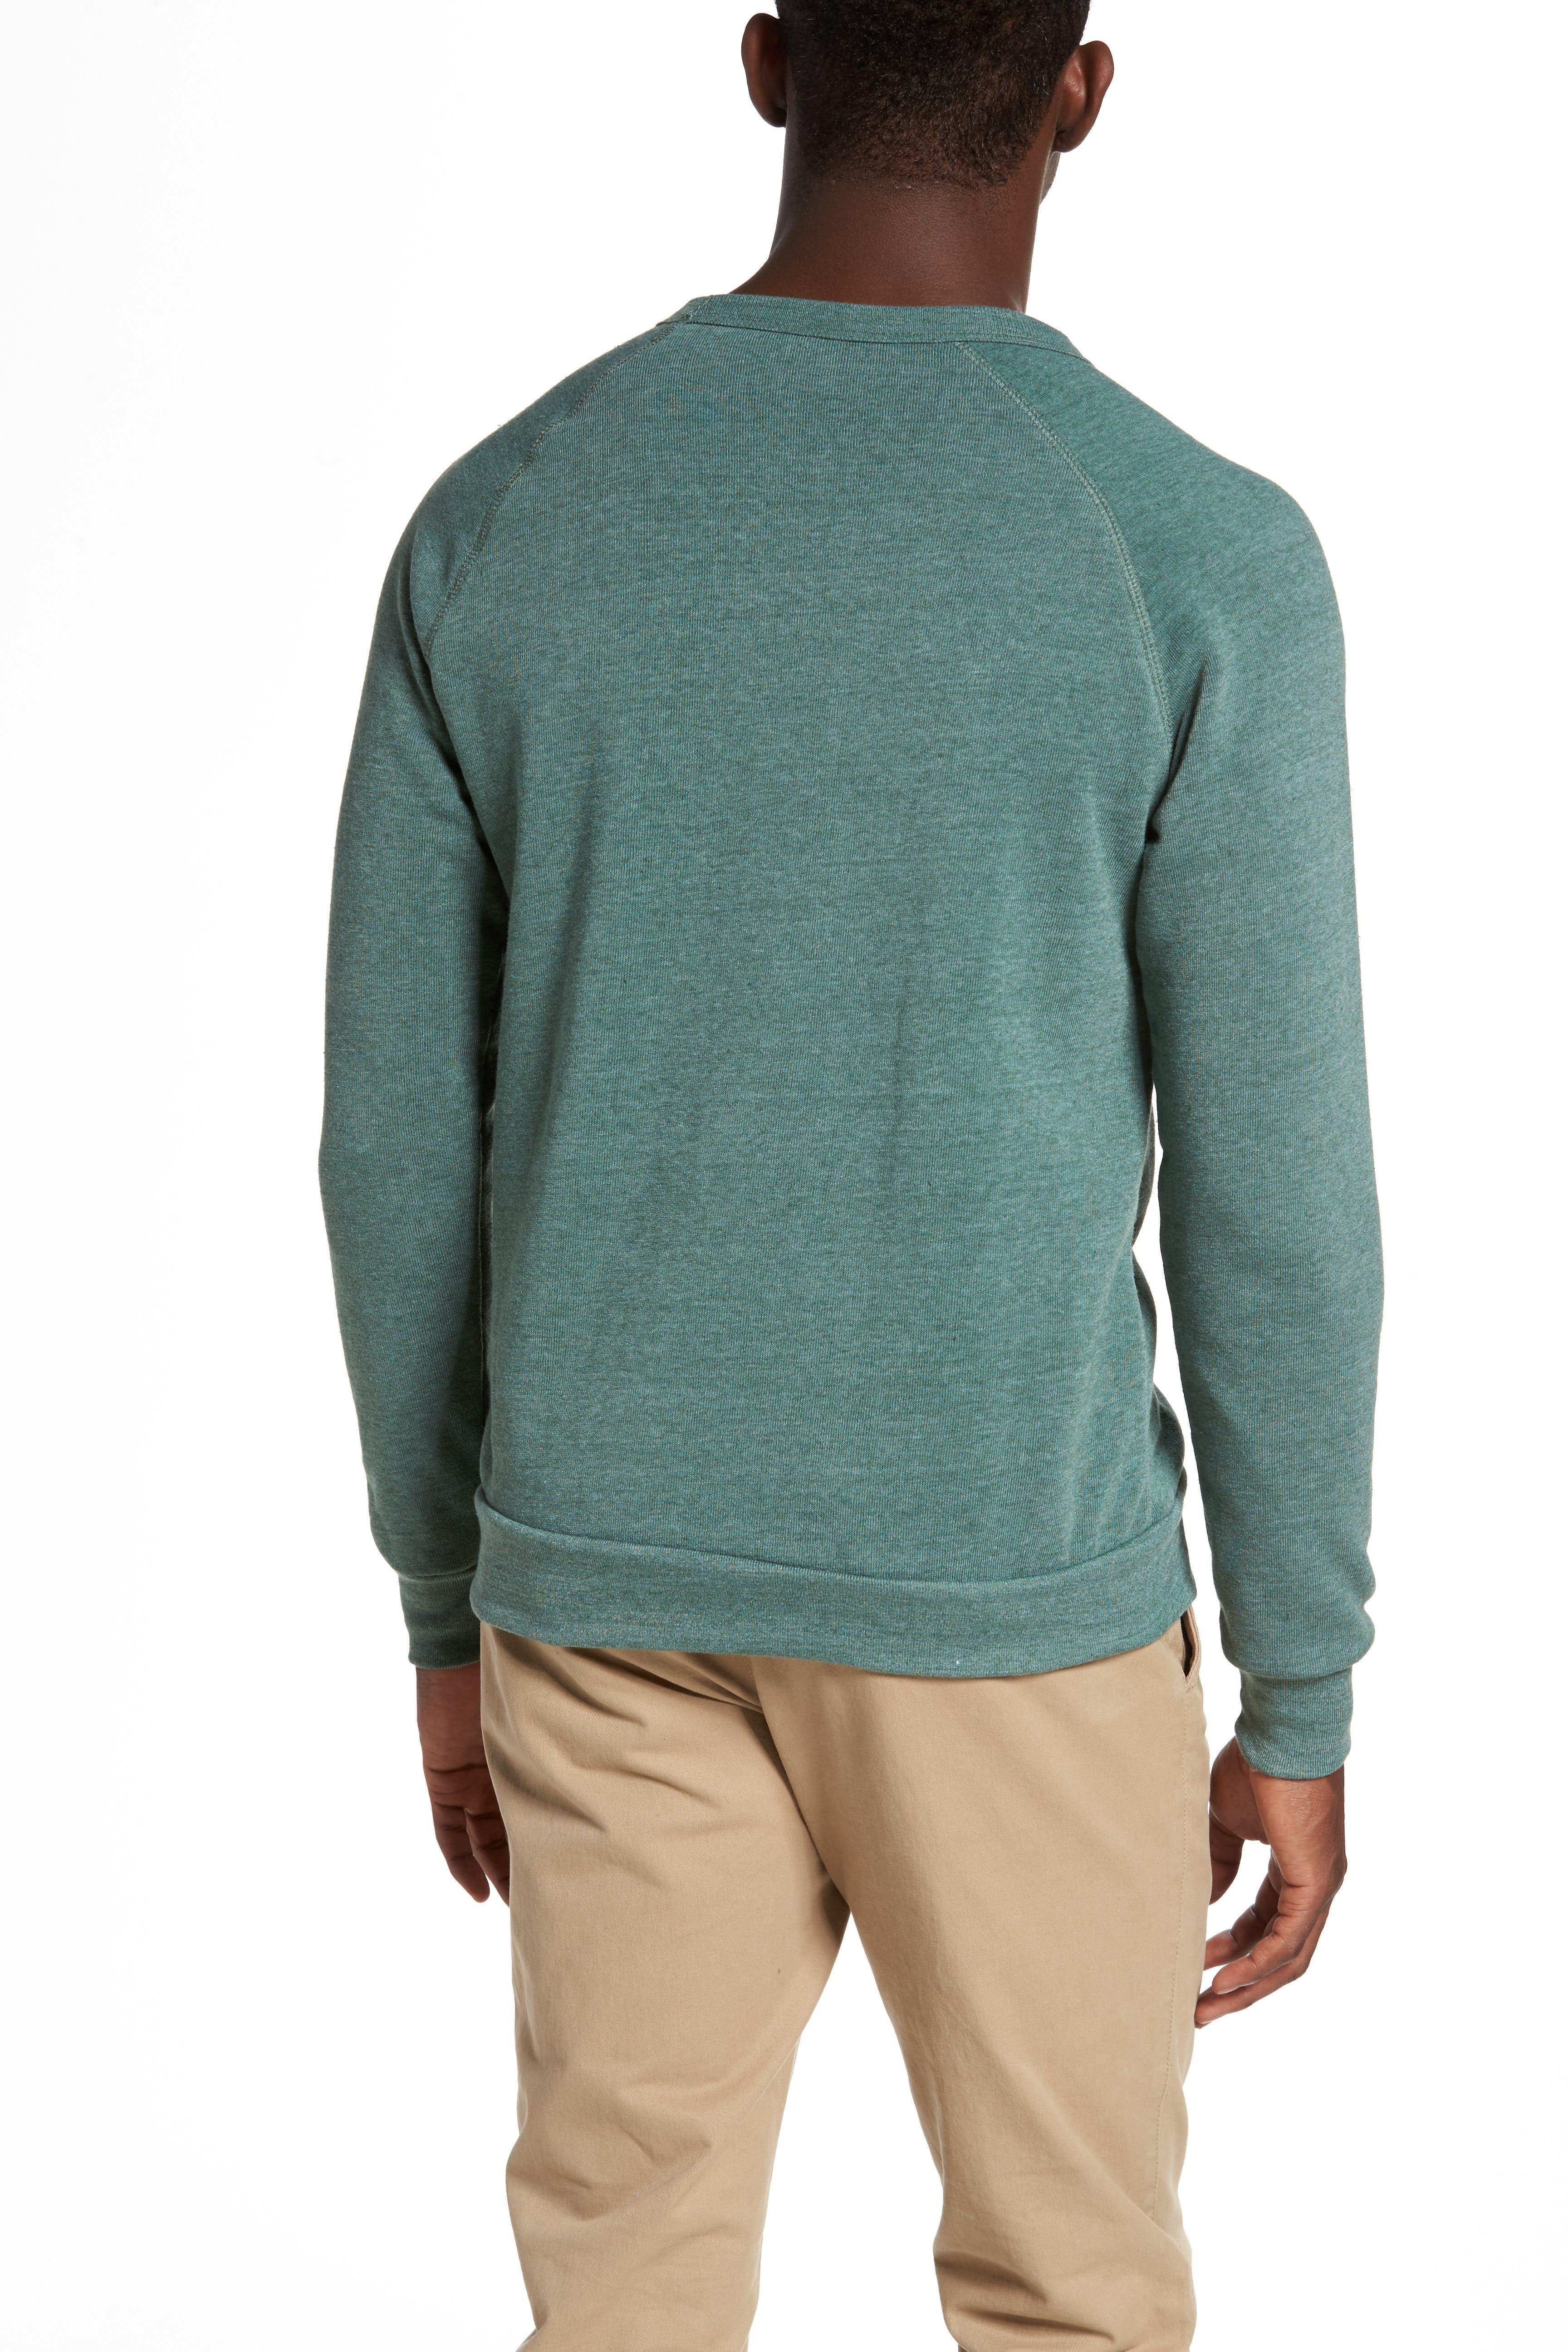 'The Champ' Sweatshirt,                             Alternate thumbnail 57, color,